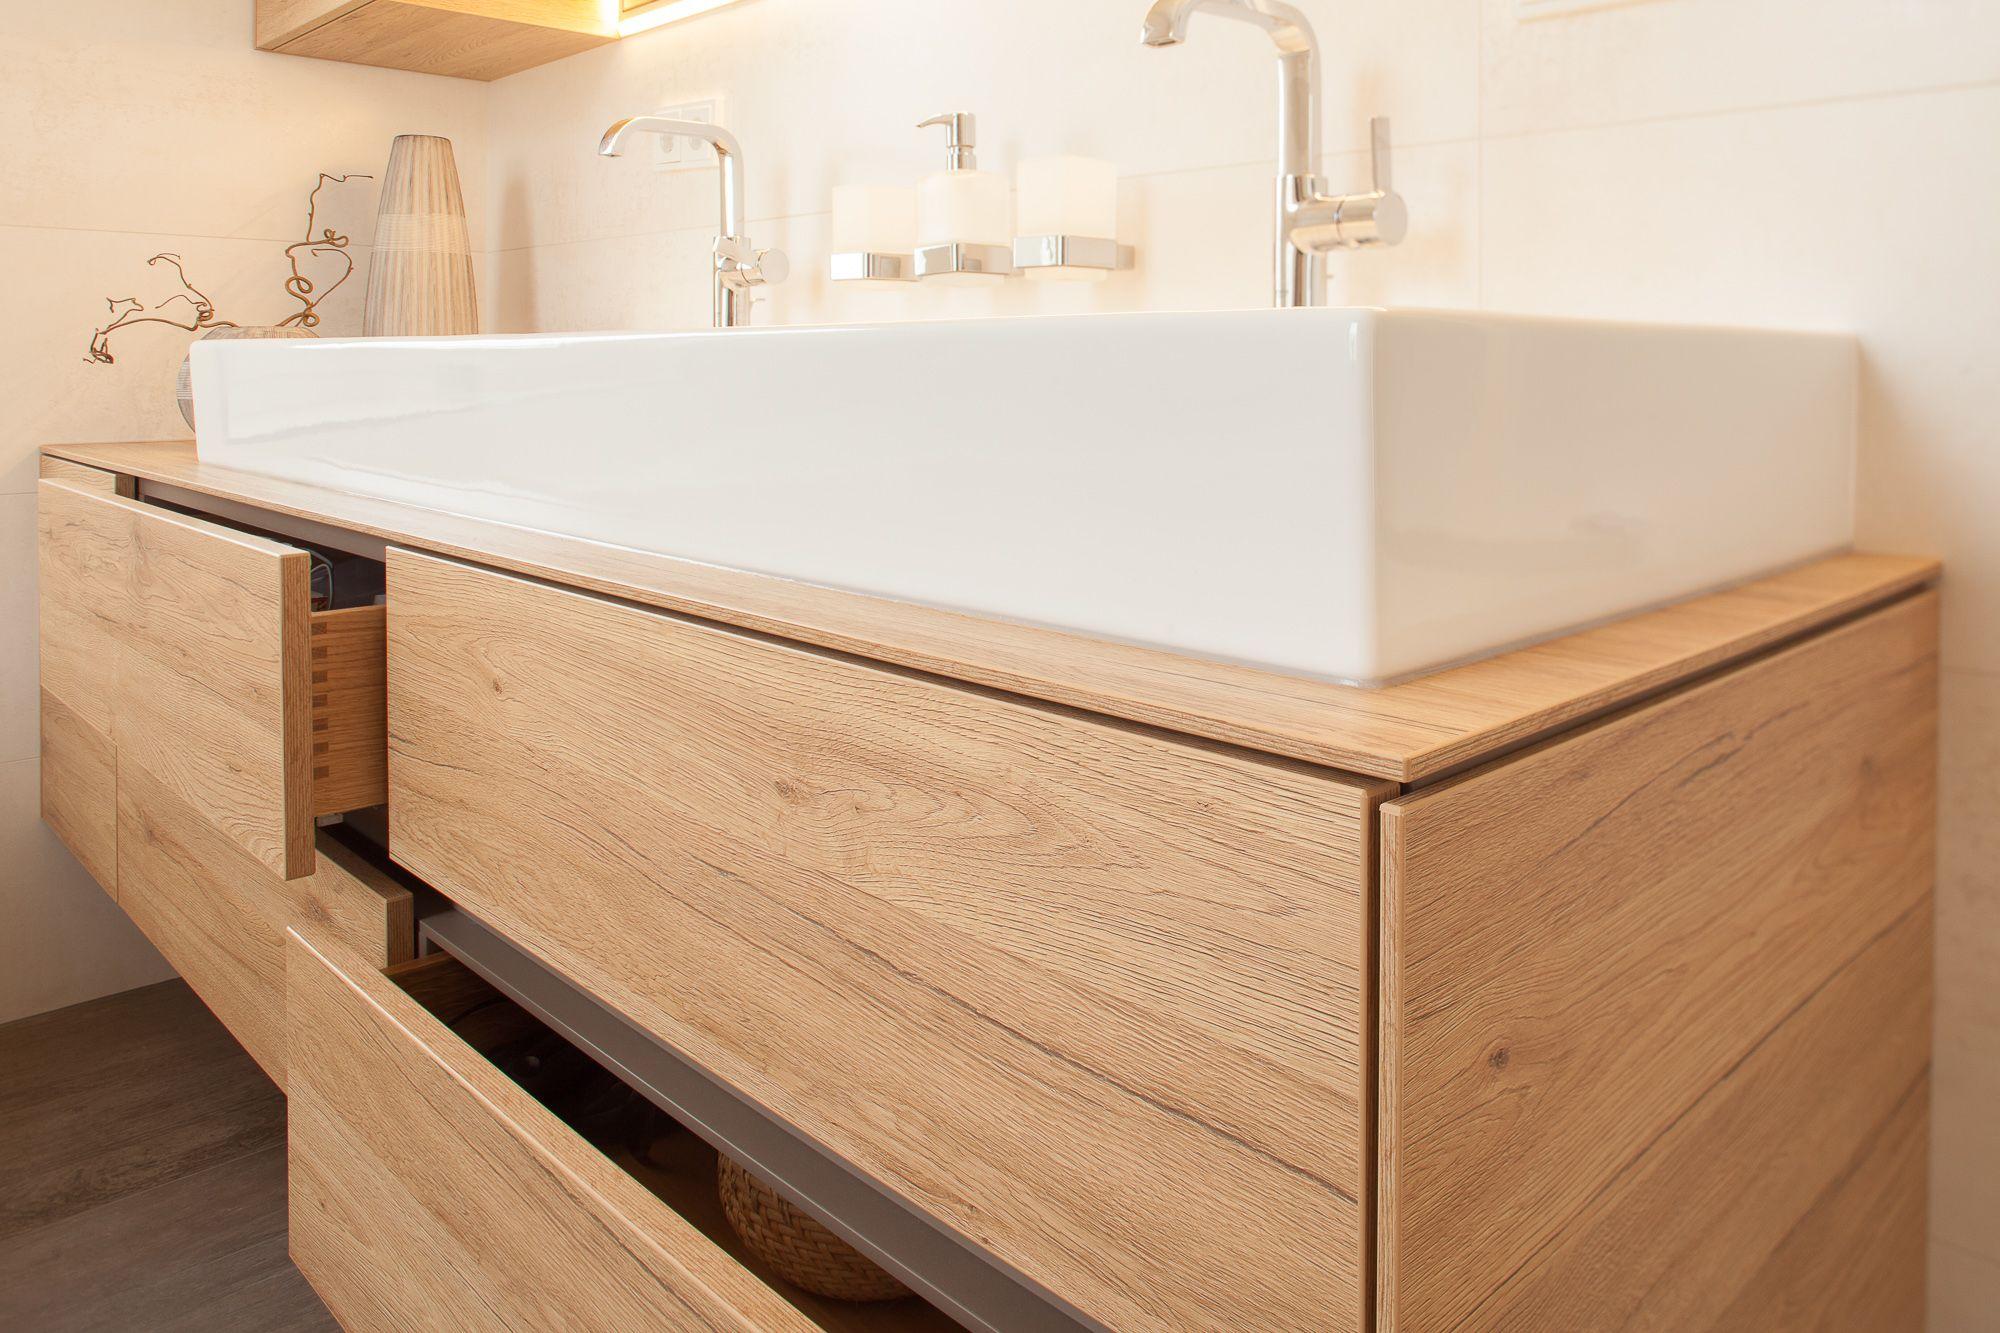 Krumhuber Design Konzept Gr Badezimmer Im Erdgeschoss Badezimmerideen Waschbeckenunterschrank